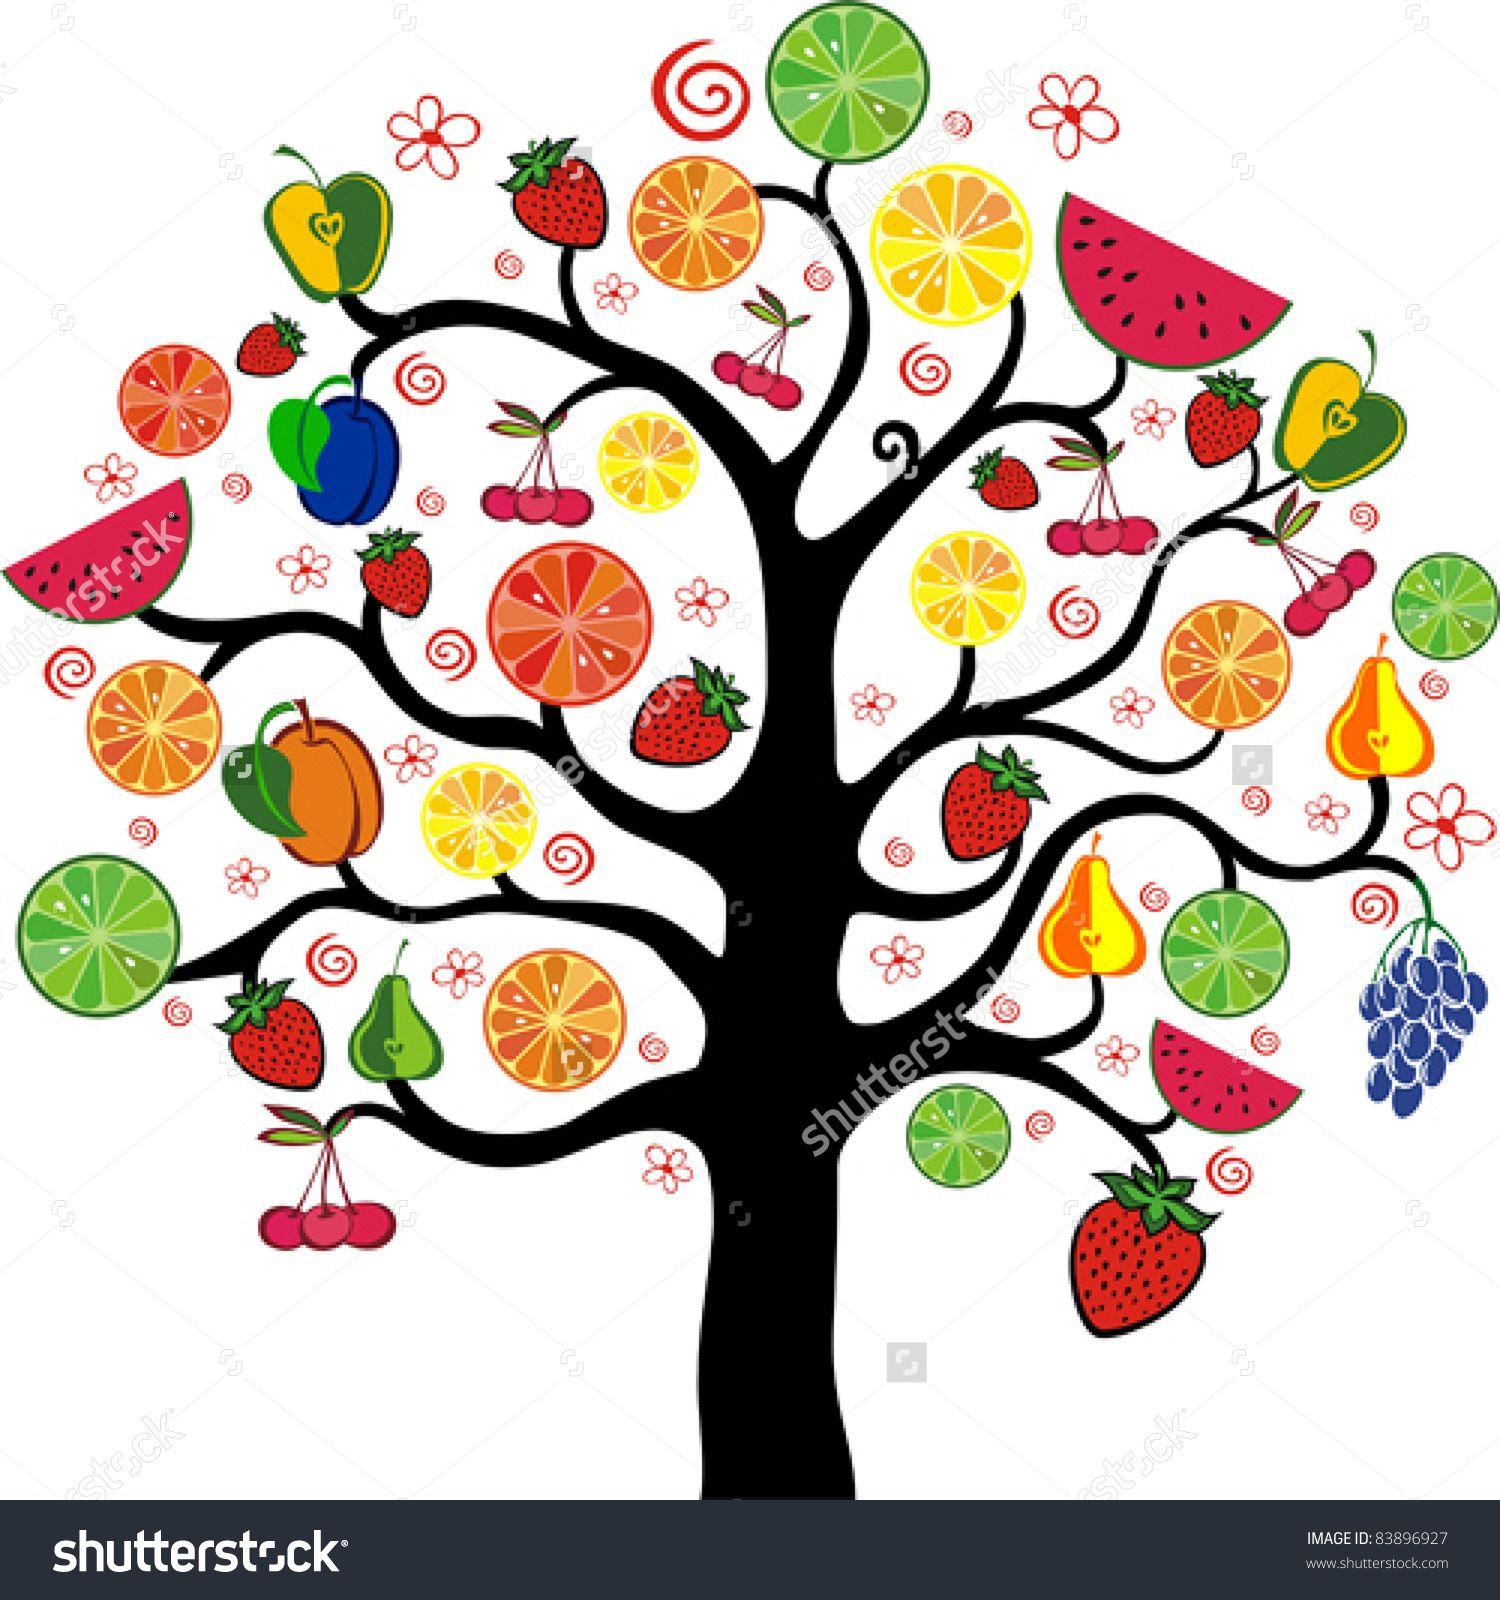 Clipart trees fruit. Mixed fruits tree isolated